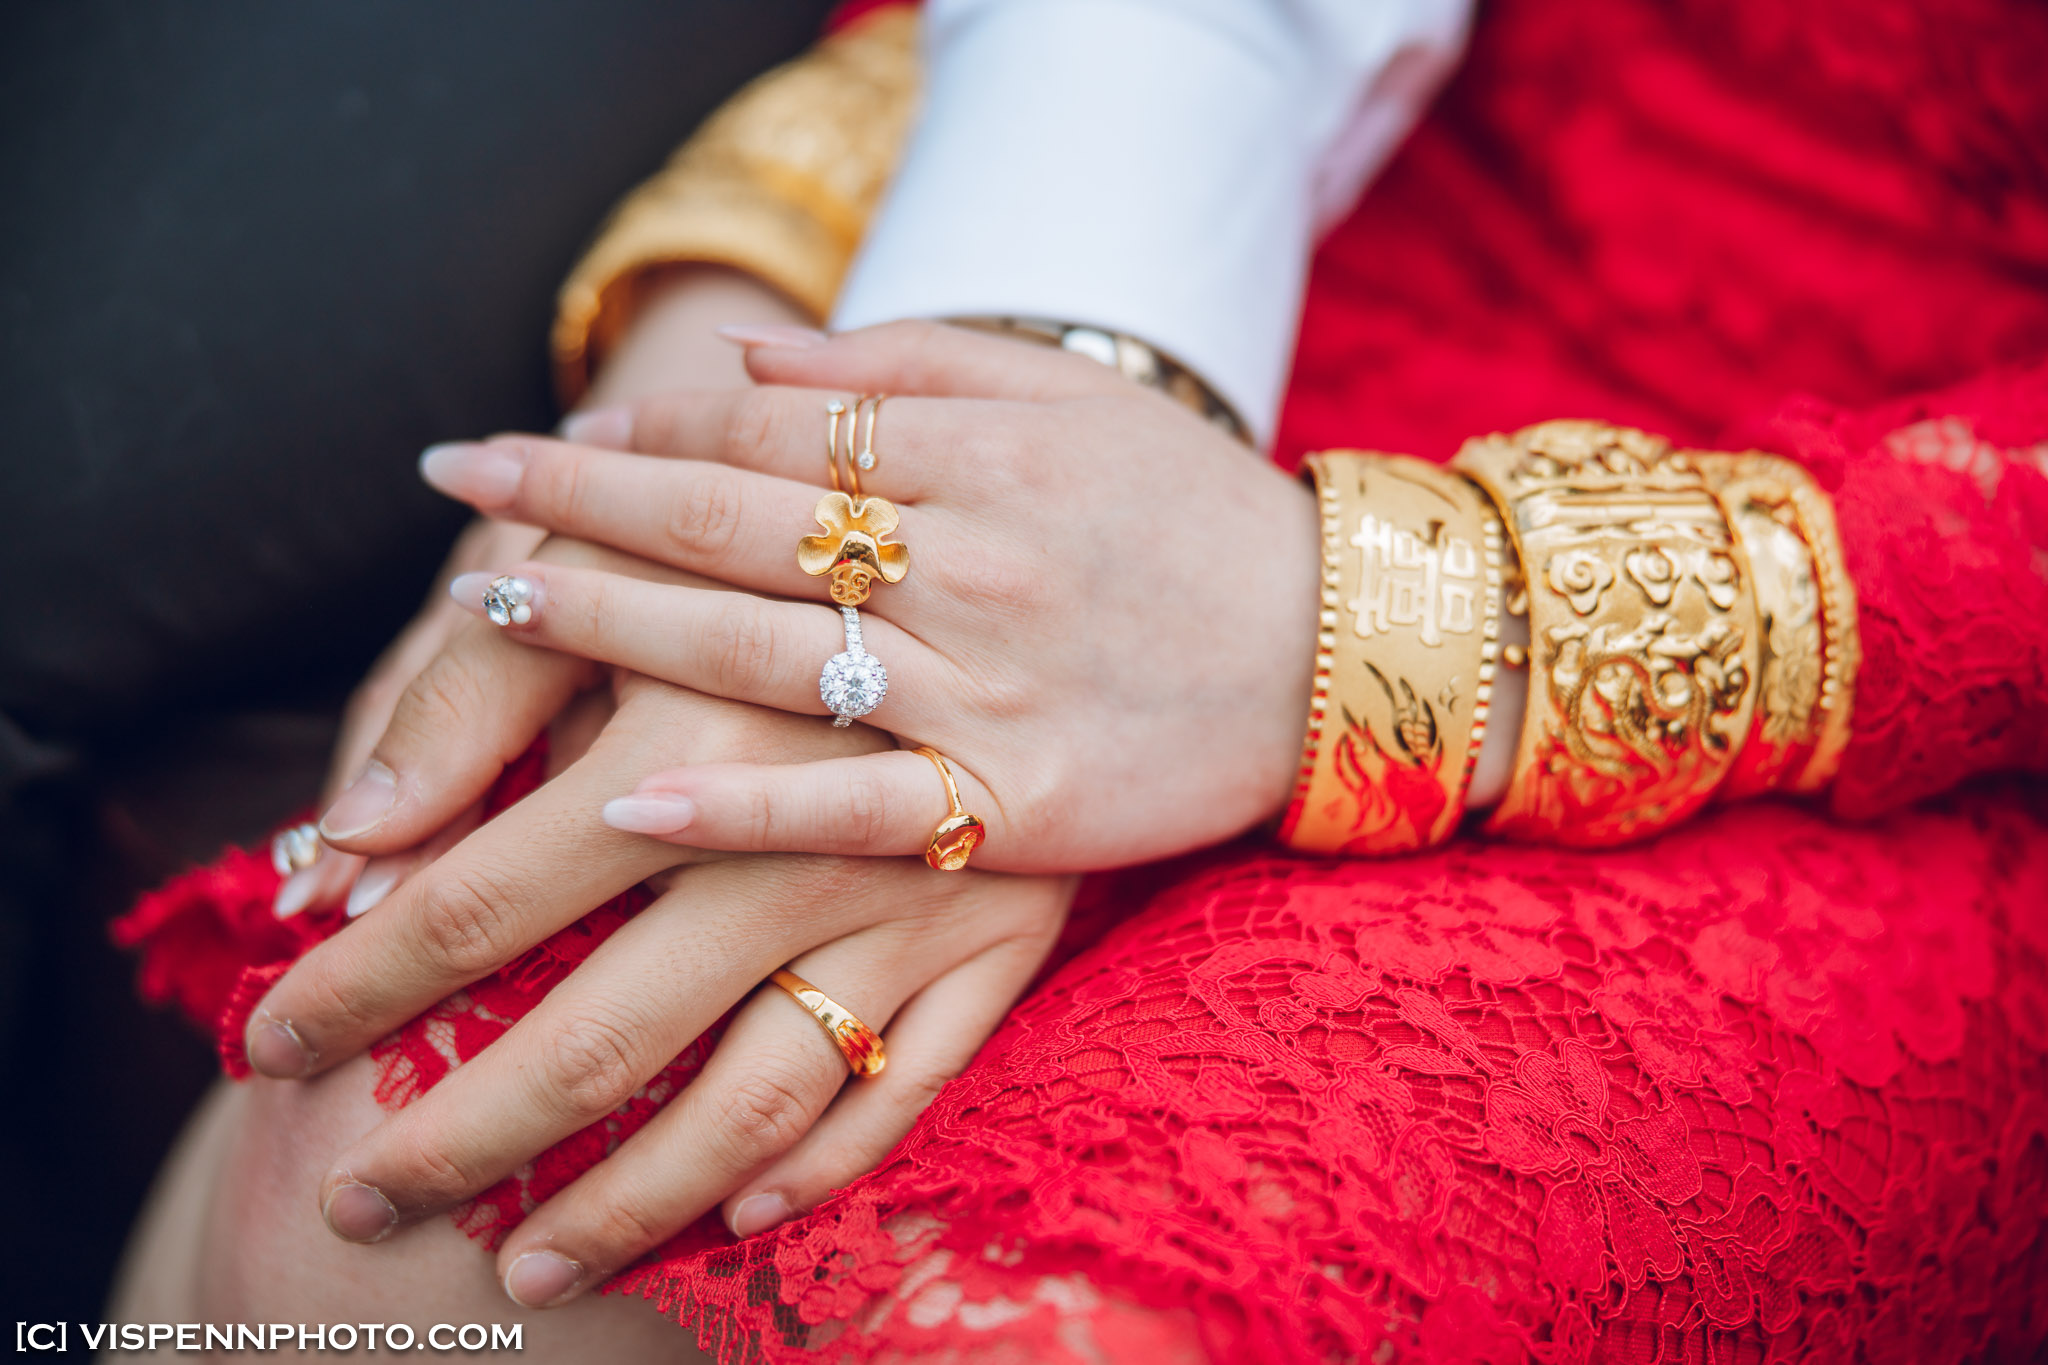 WEDDING DAY Photography Melbourne VISPENN 墨尔本 婚礼跟拍 婚礼摄像 婚礼摄影 结婚照 登记照 ElitaPB 02739 1P EOSR VISPENN